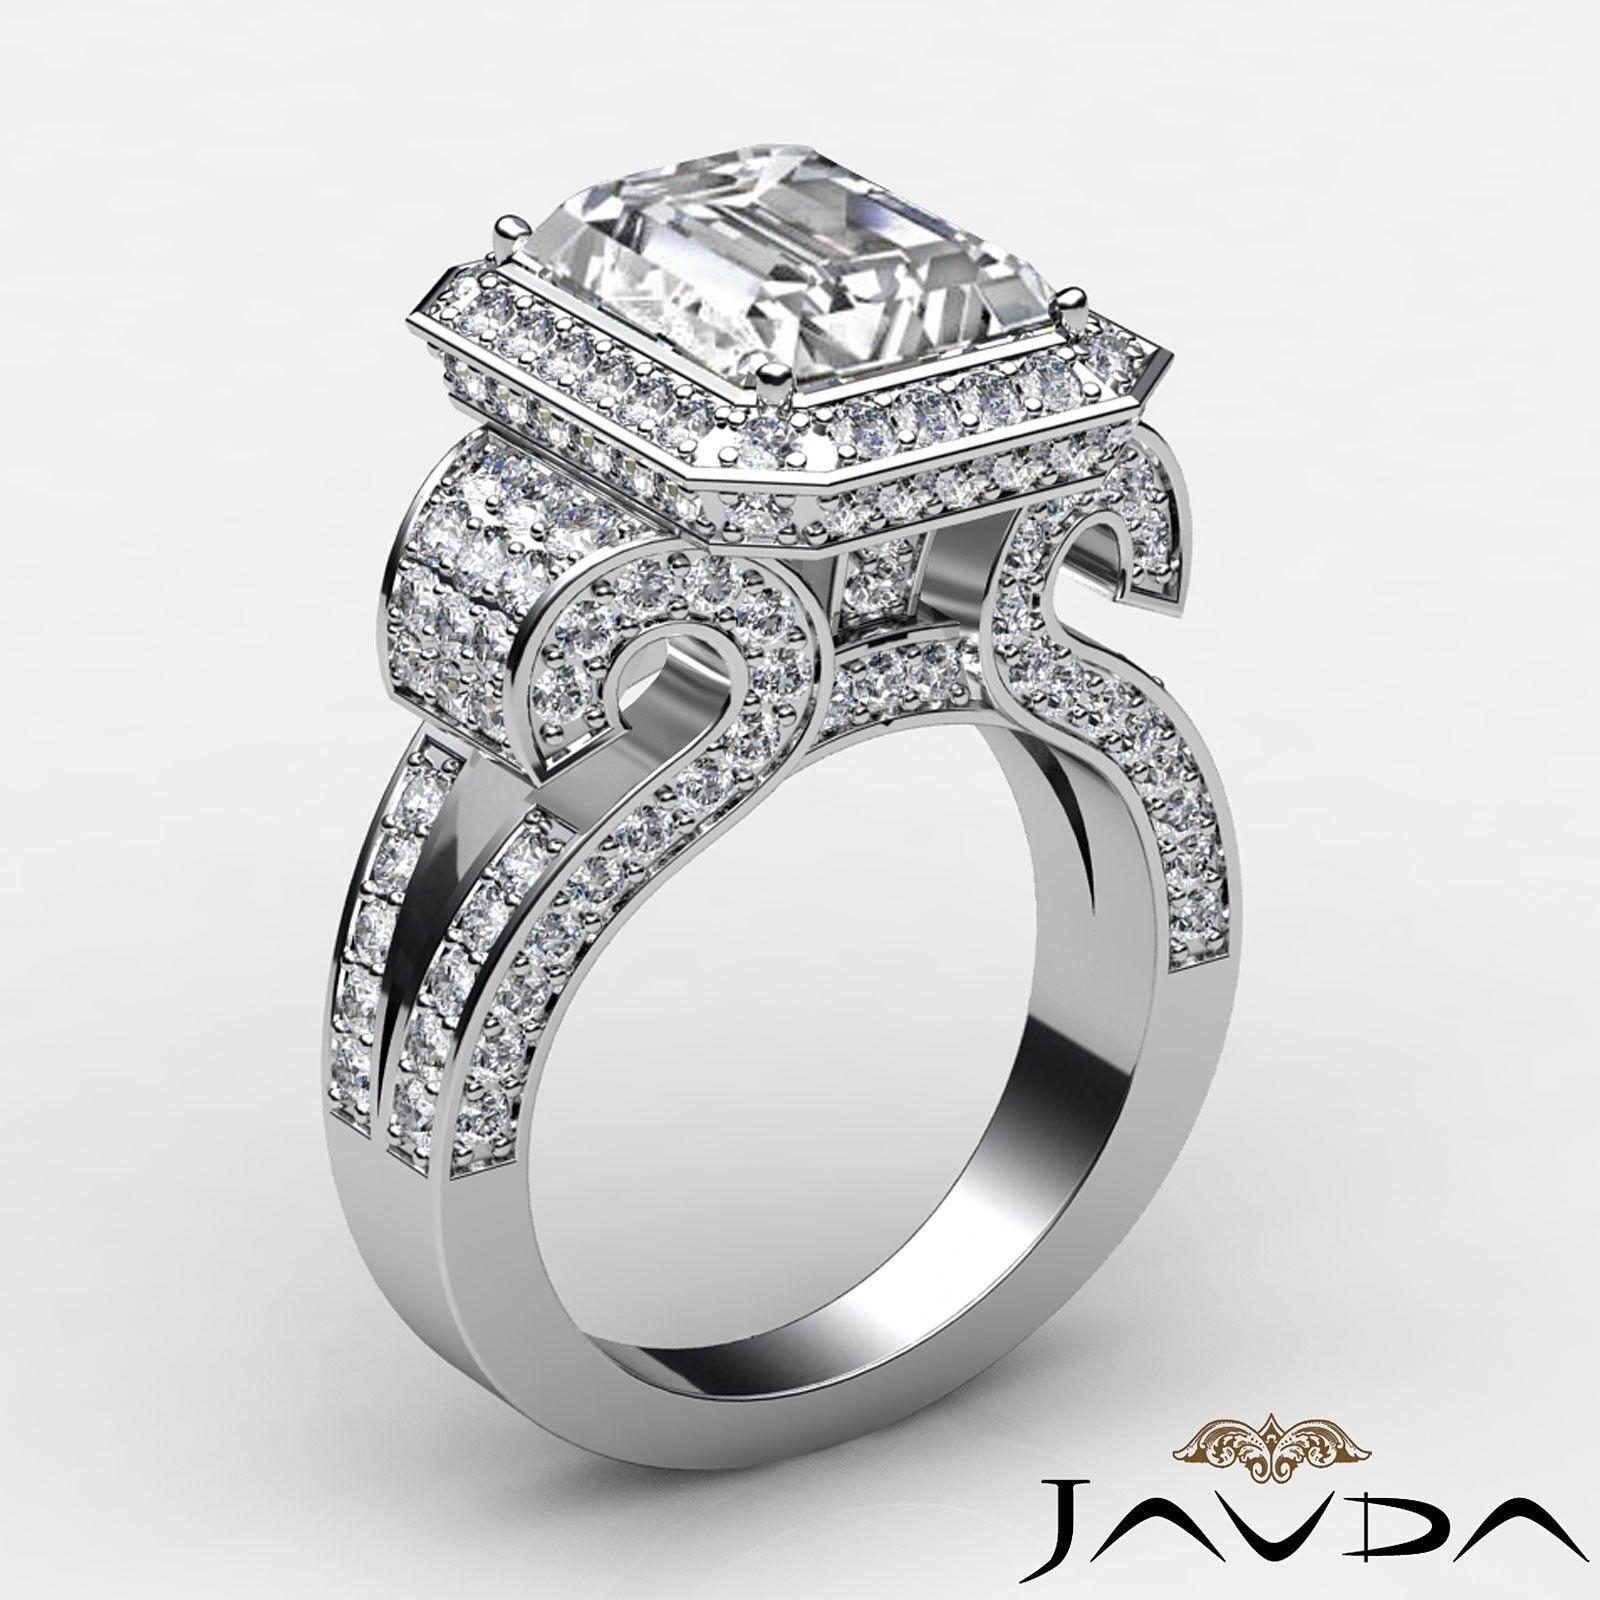 4.4ctw Antique Vintage Halo Emerald Diamond Engagement Ring GIA I-VS1 White Gold 1